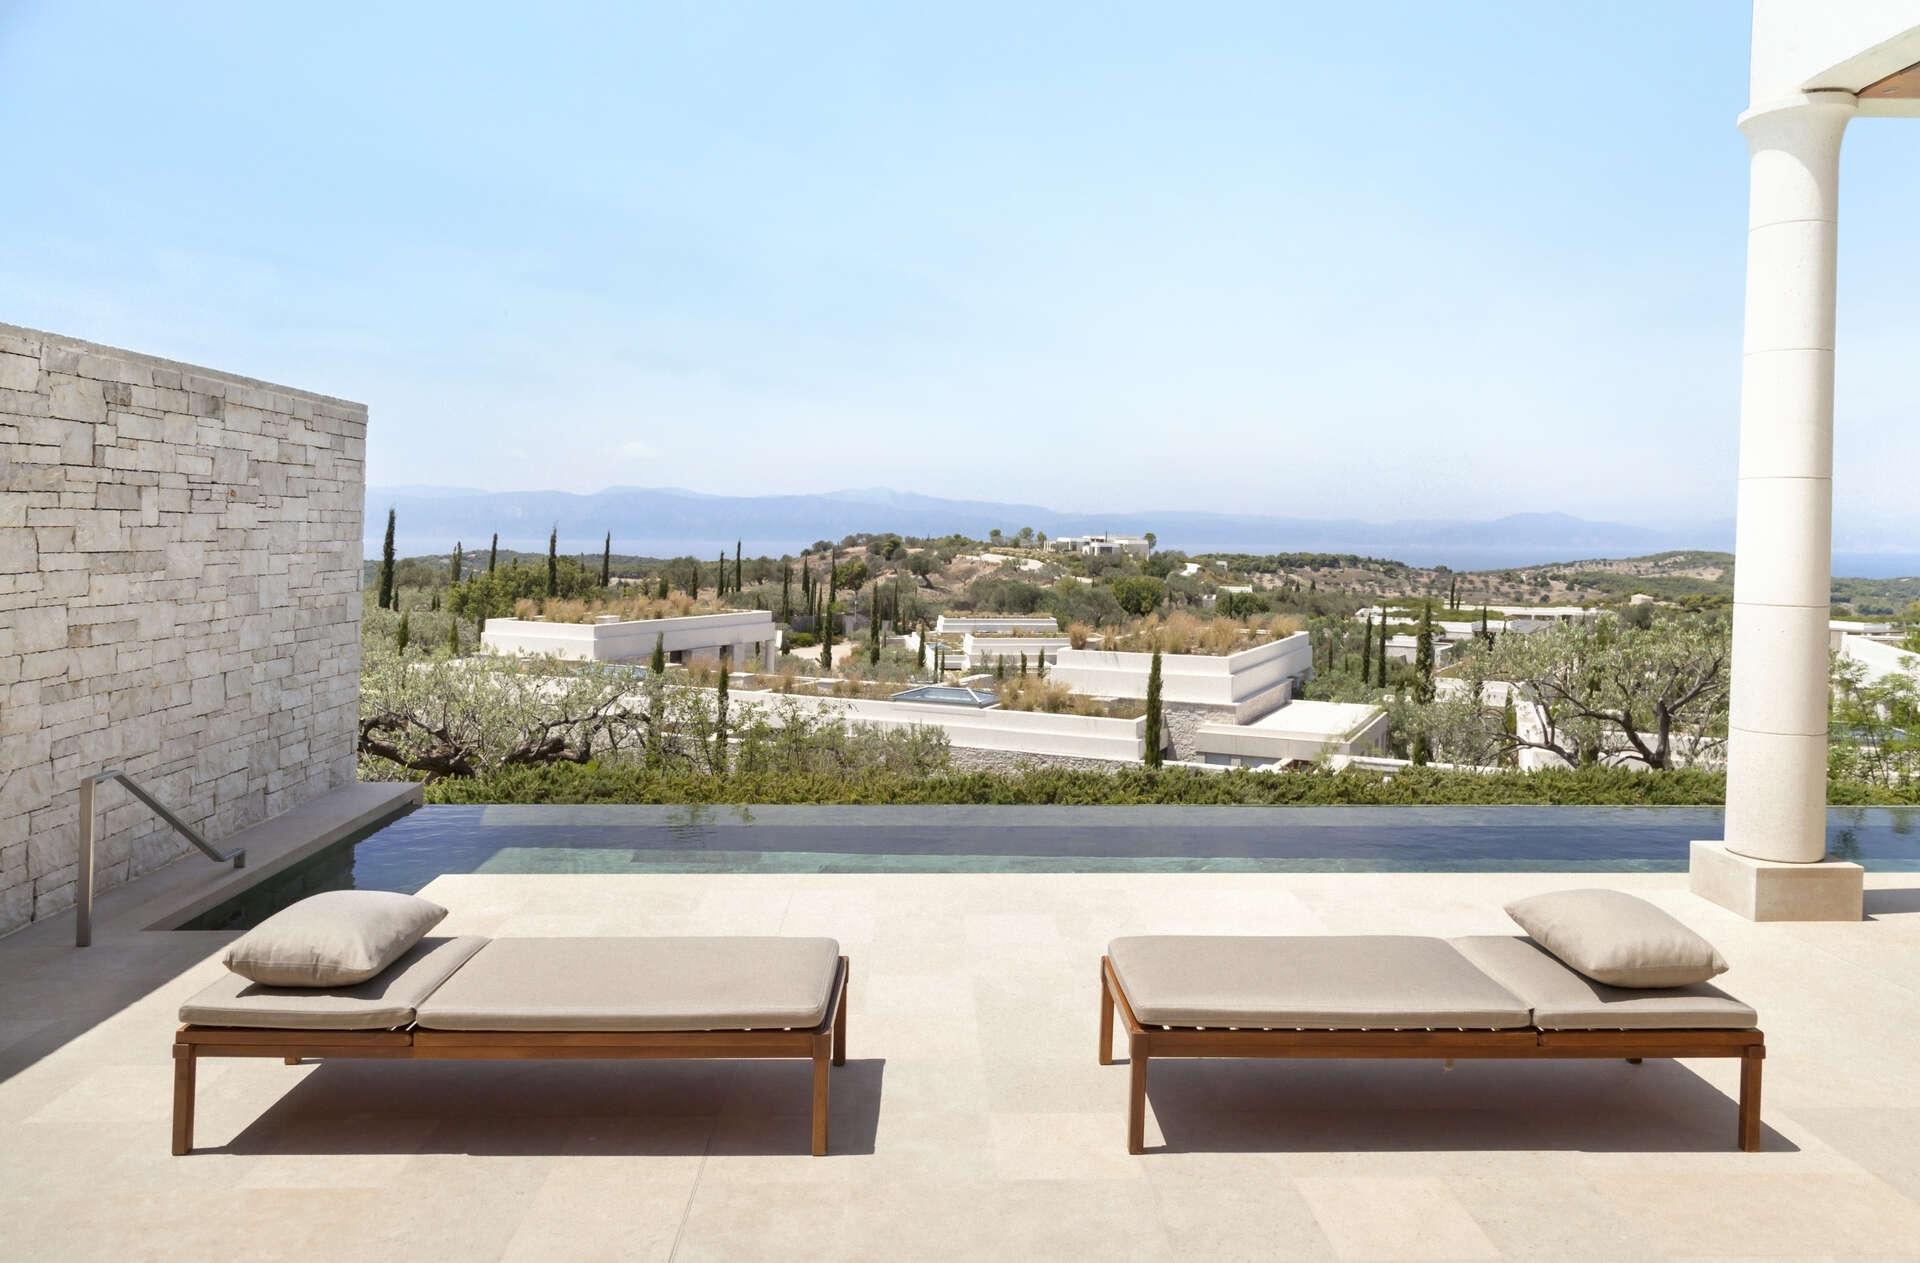 Luxury vacation rentals europe - Greece - Argolis - Amanzoe - Deluxe Premium Pool Pavilion - Image 1/23